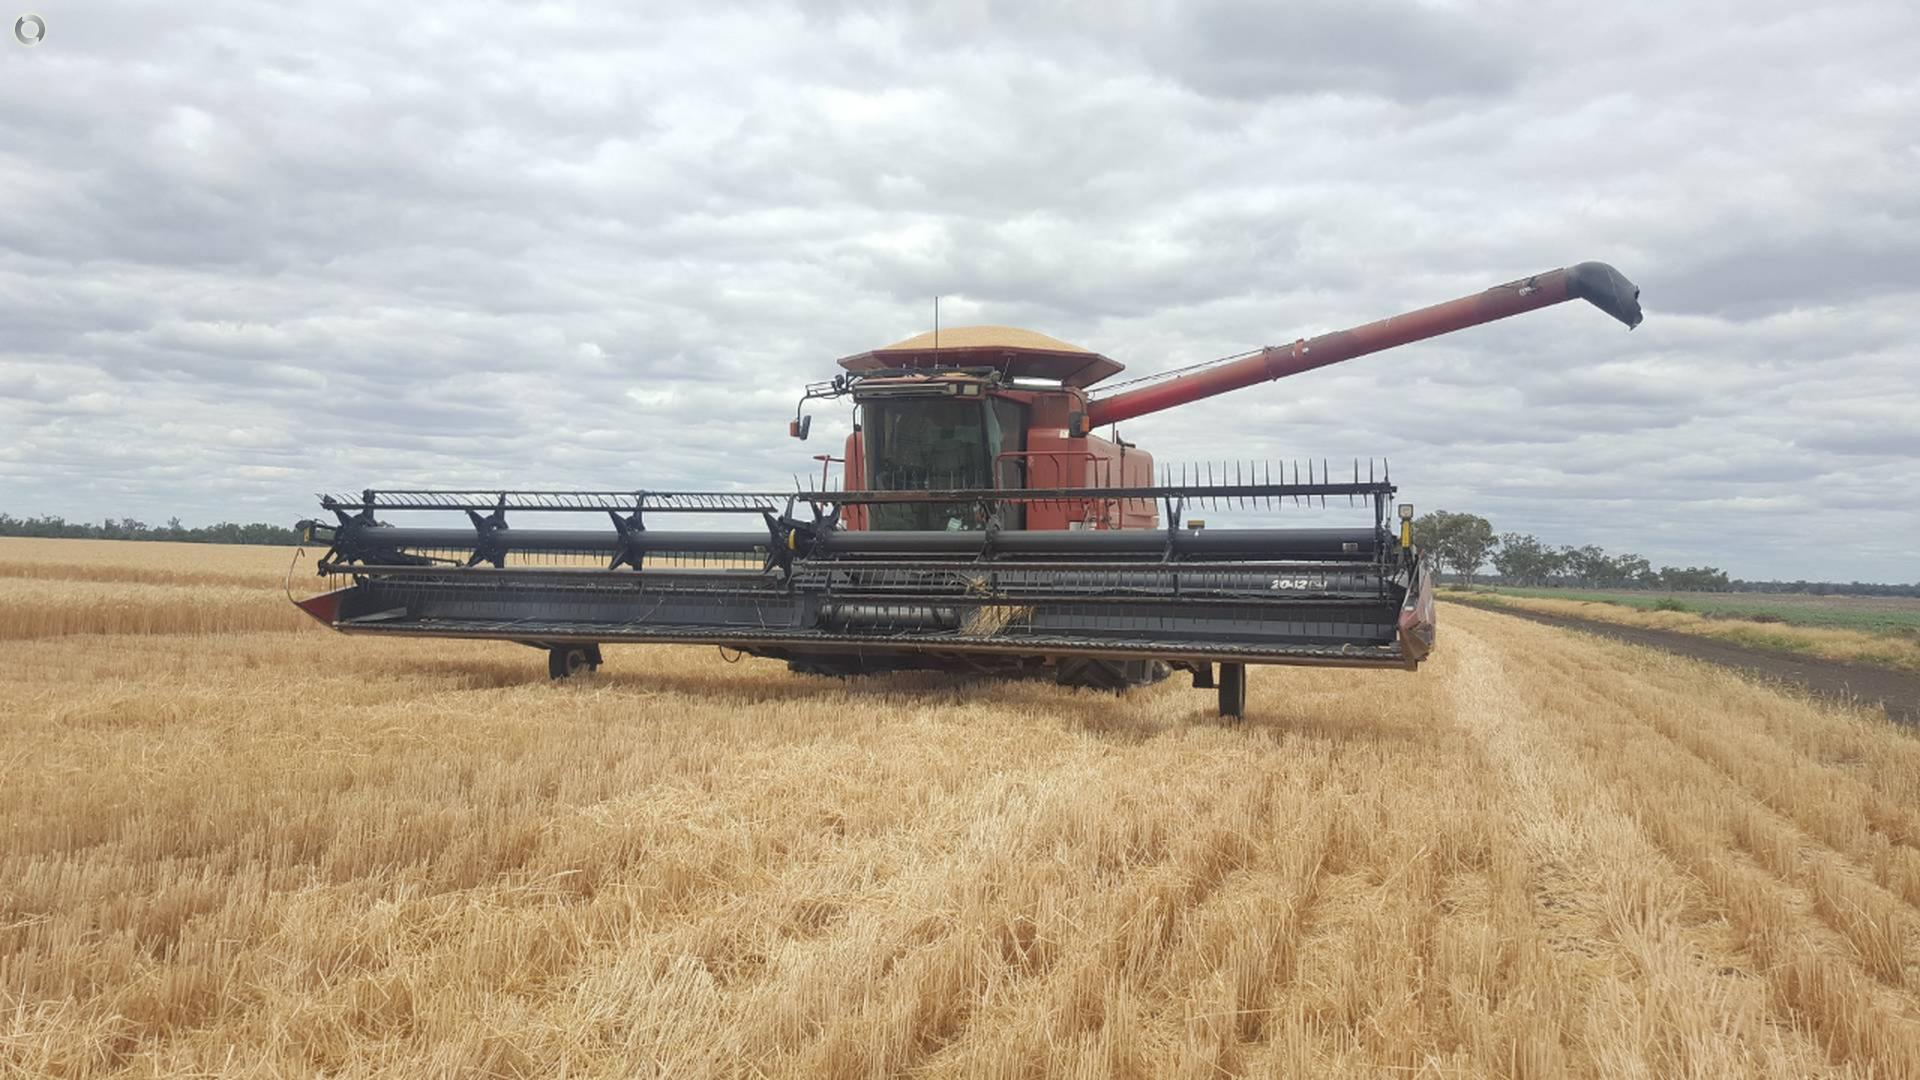 2002 CASE IH 2388 Combine Harvester